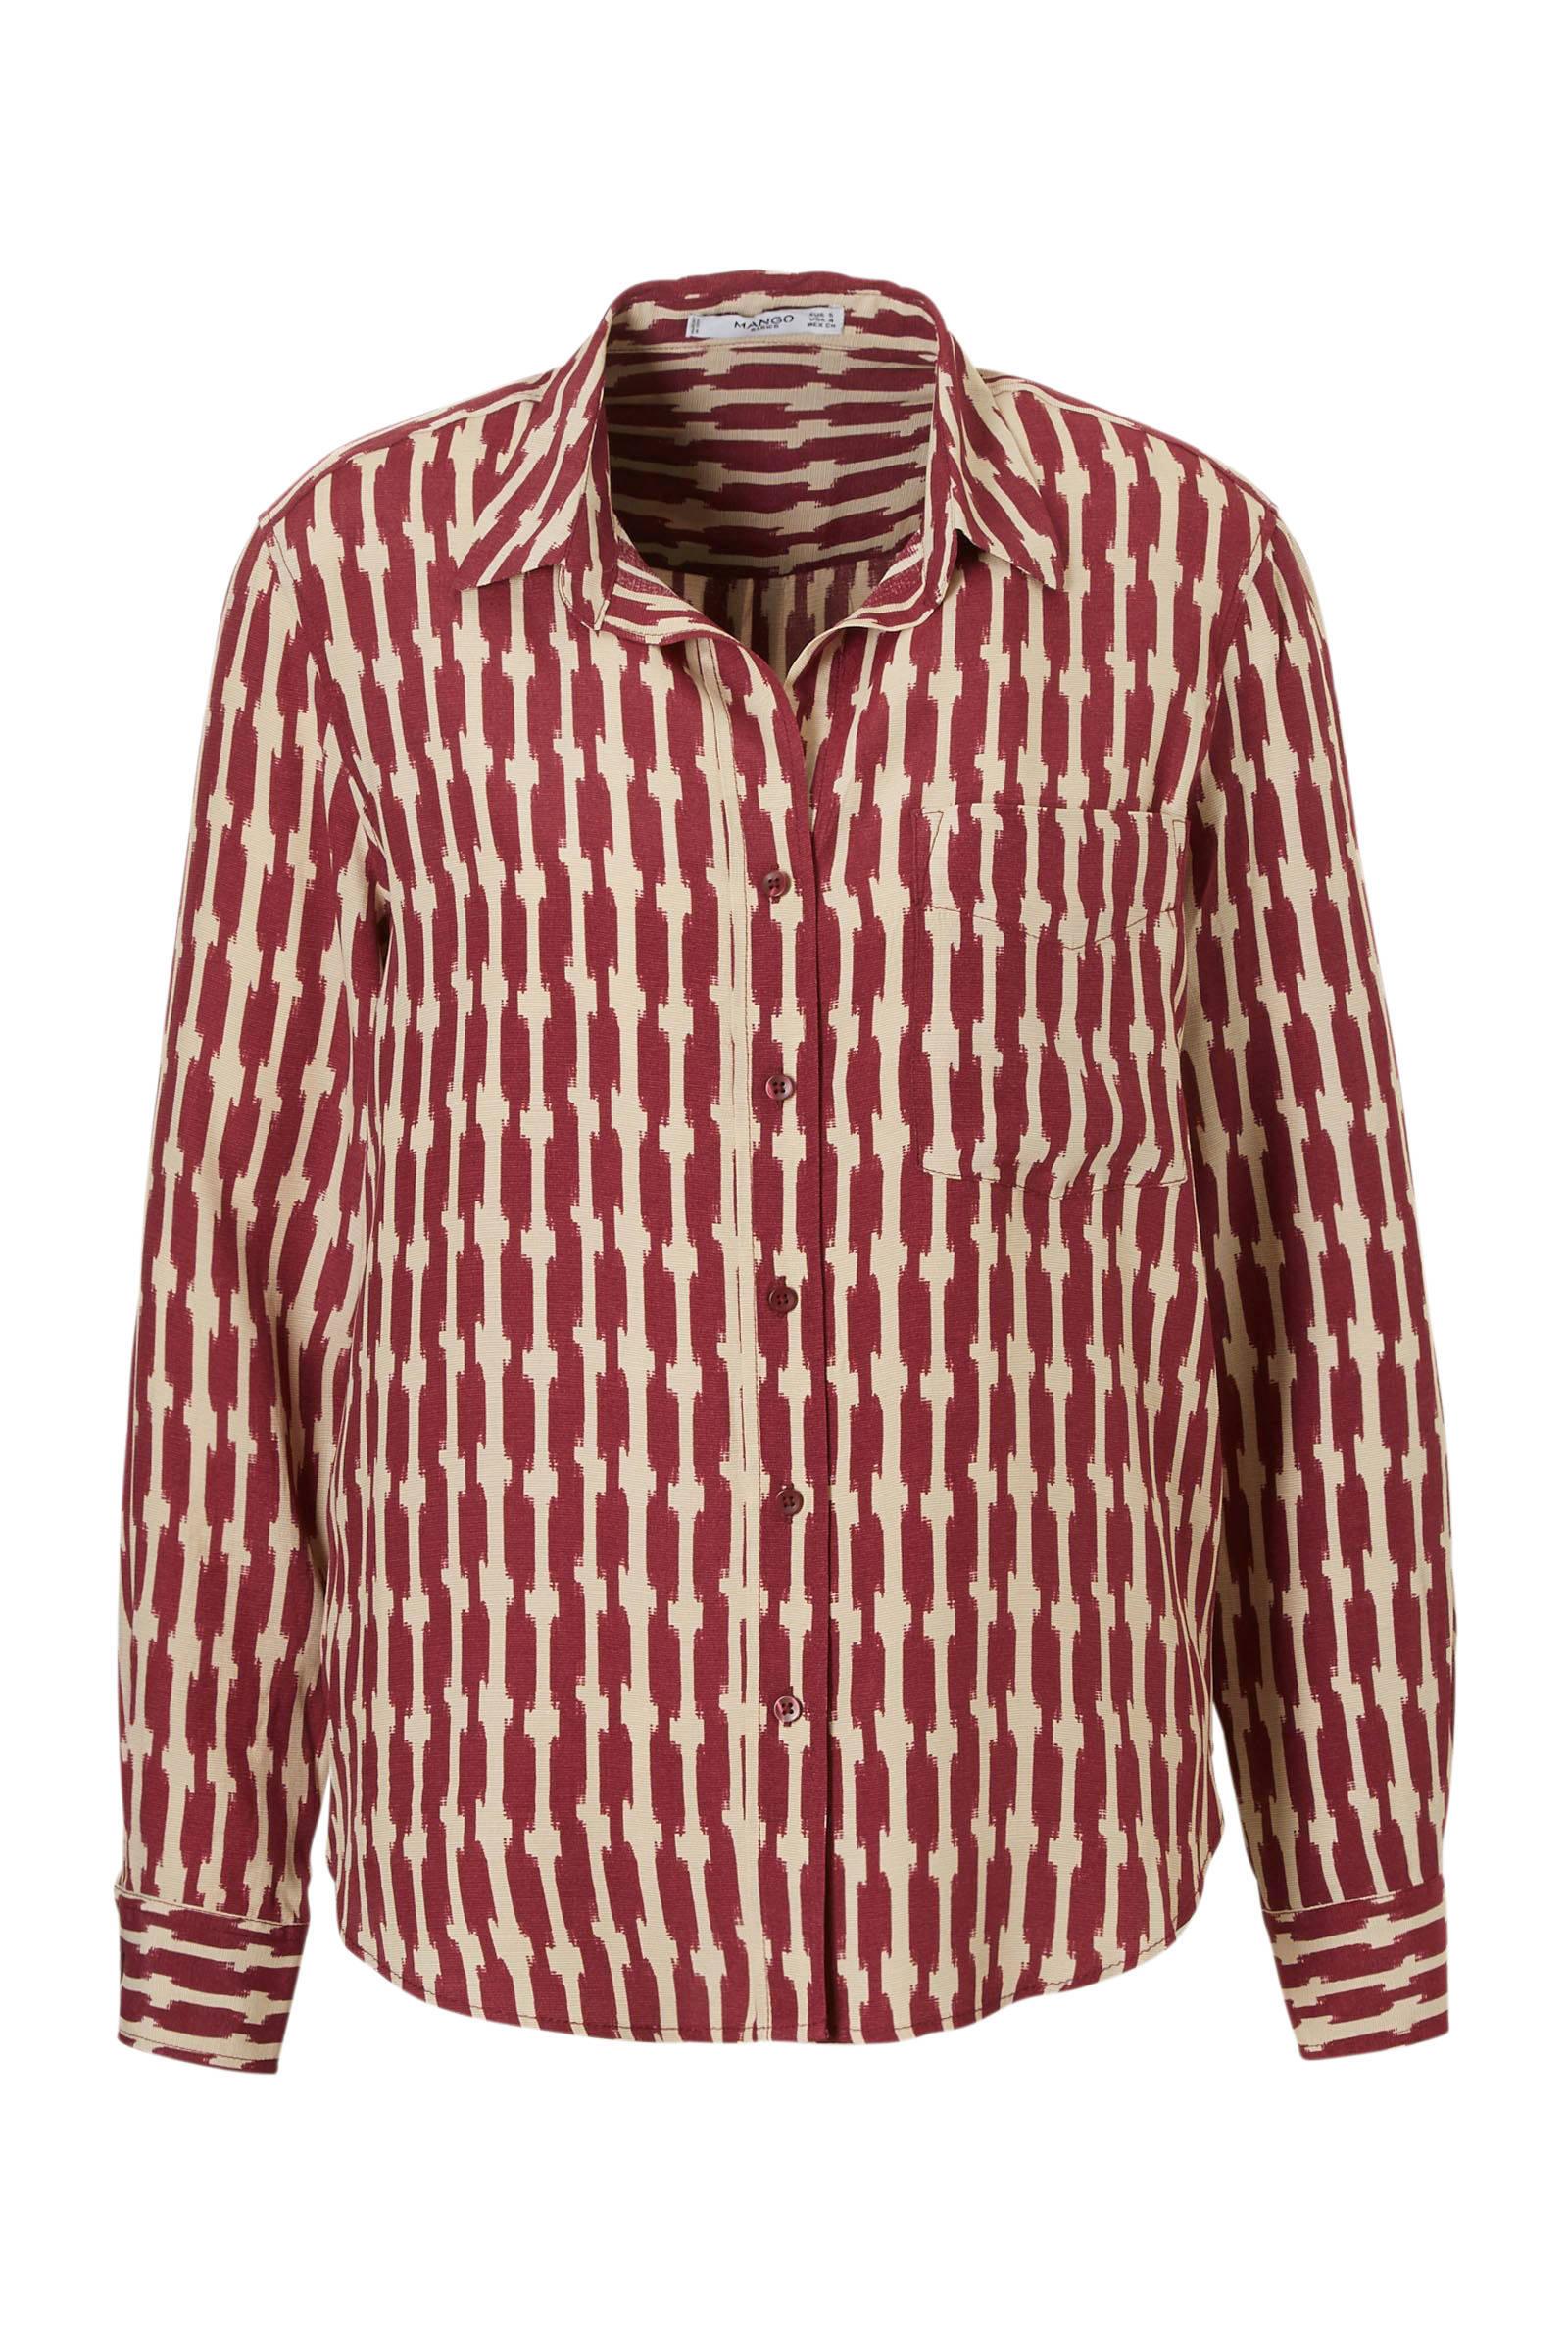 met textuur blouse bordeaux Mango textuur met blouse Mango dRqZdw